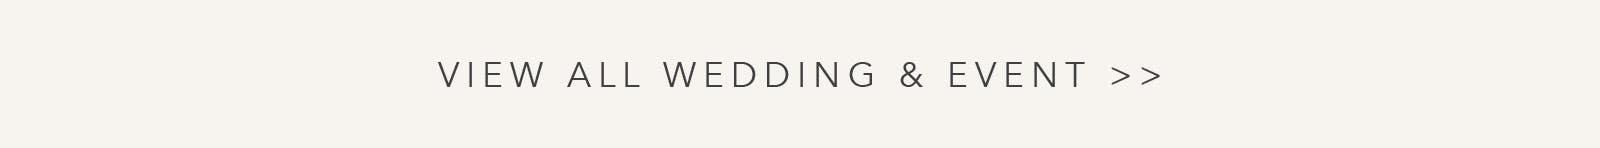 Shop All Wedding & Event